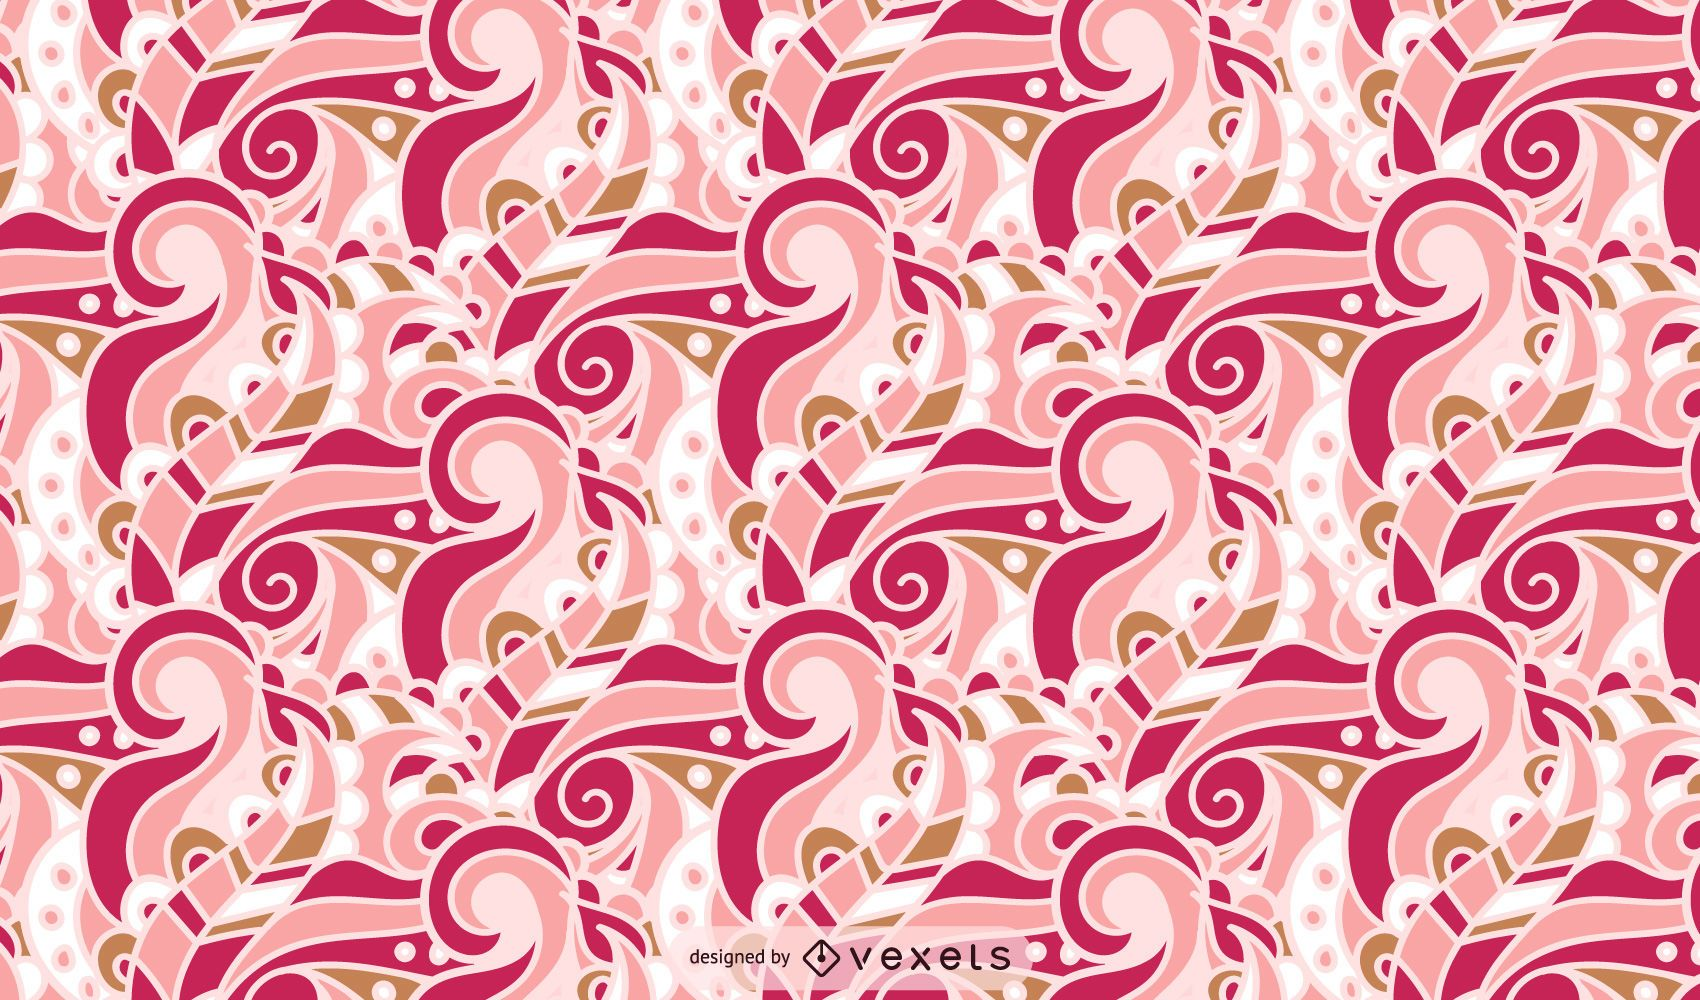 Retro Style Swirl Pattern Design